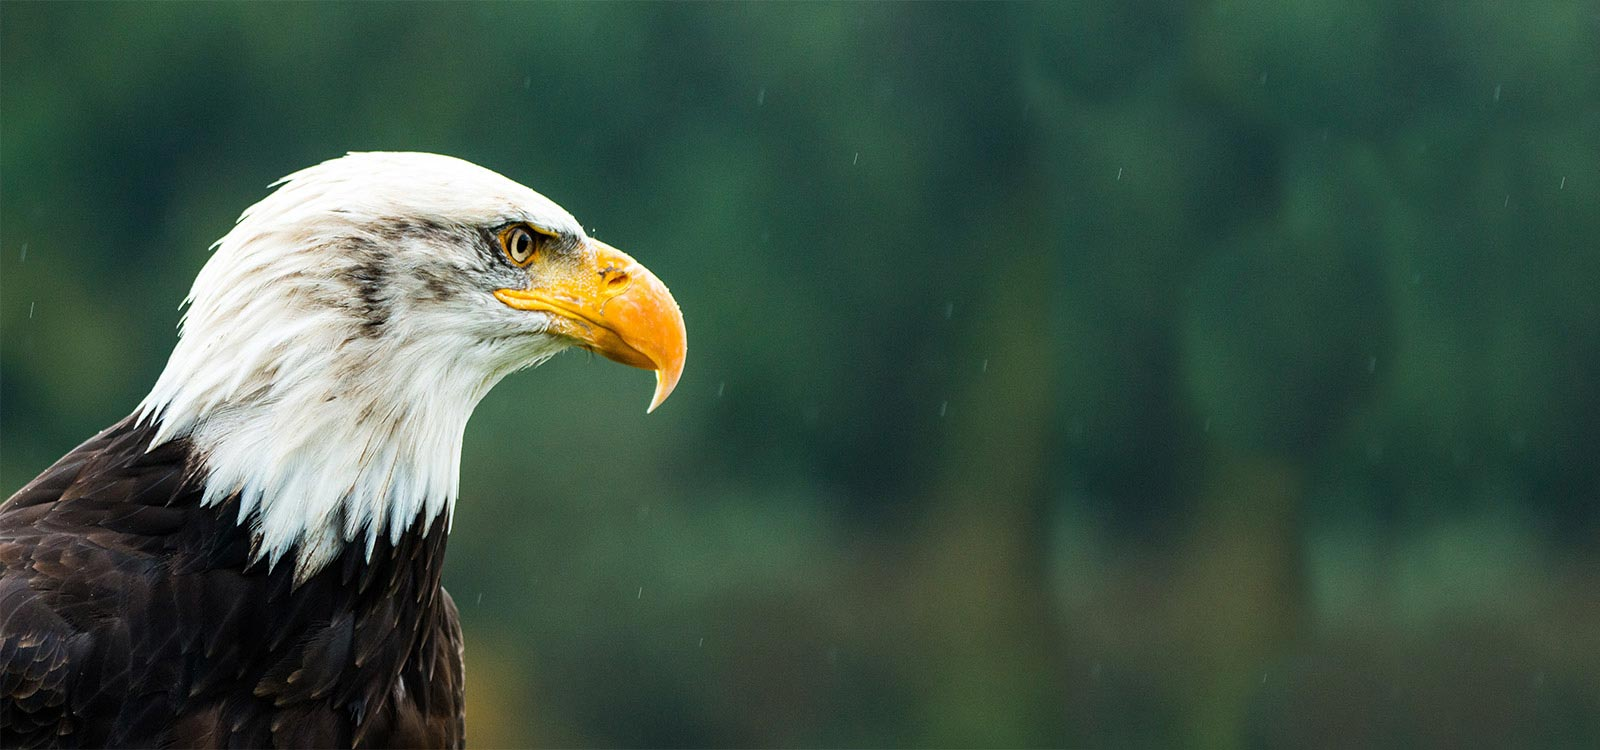 Bald Eagle - Made in America Movement